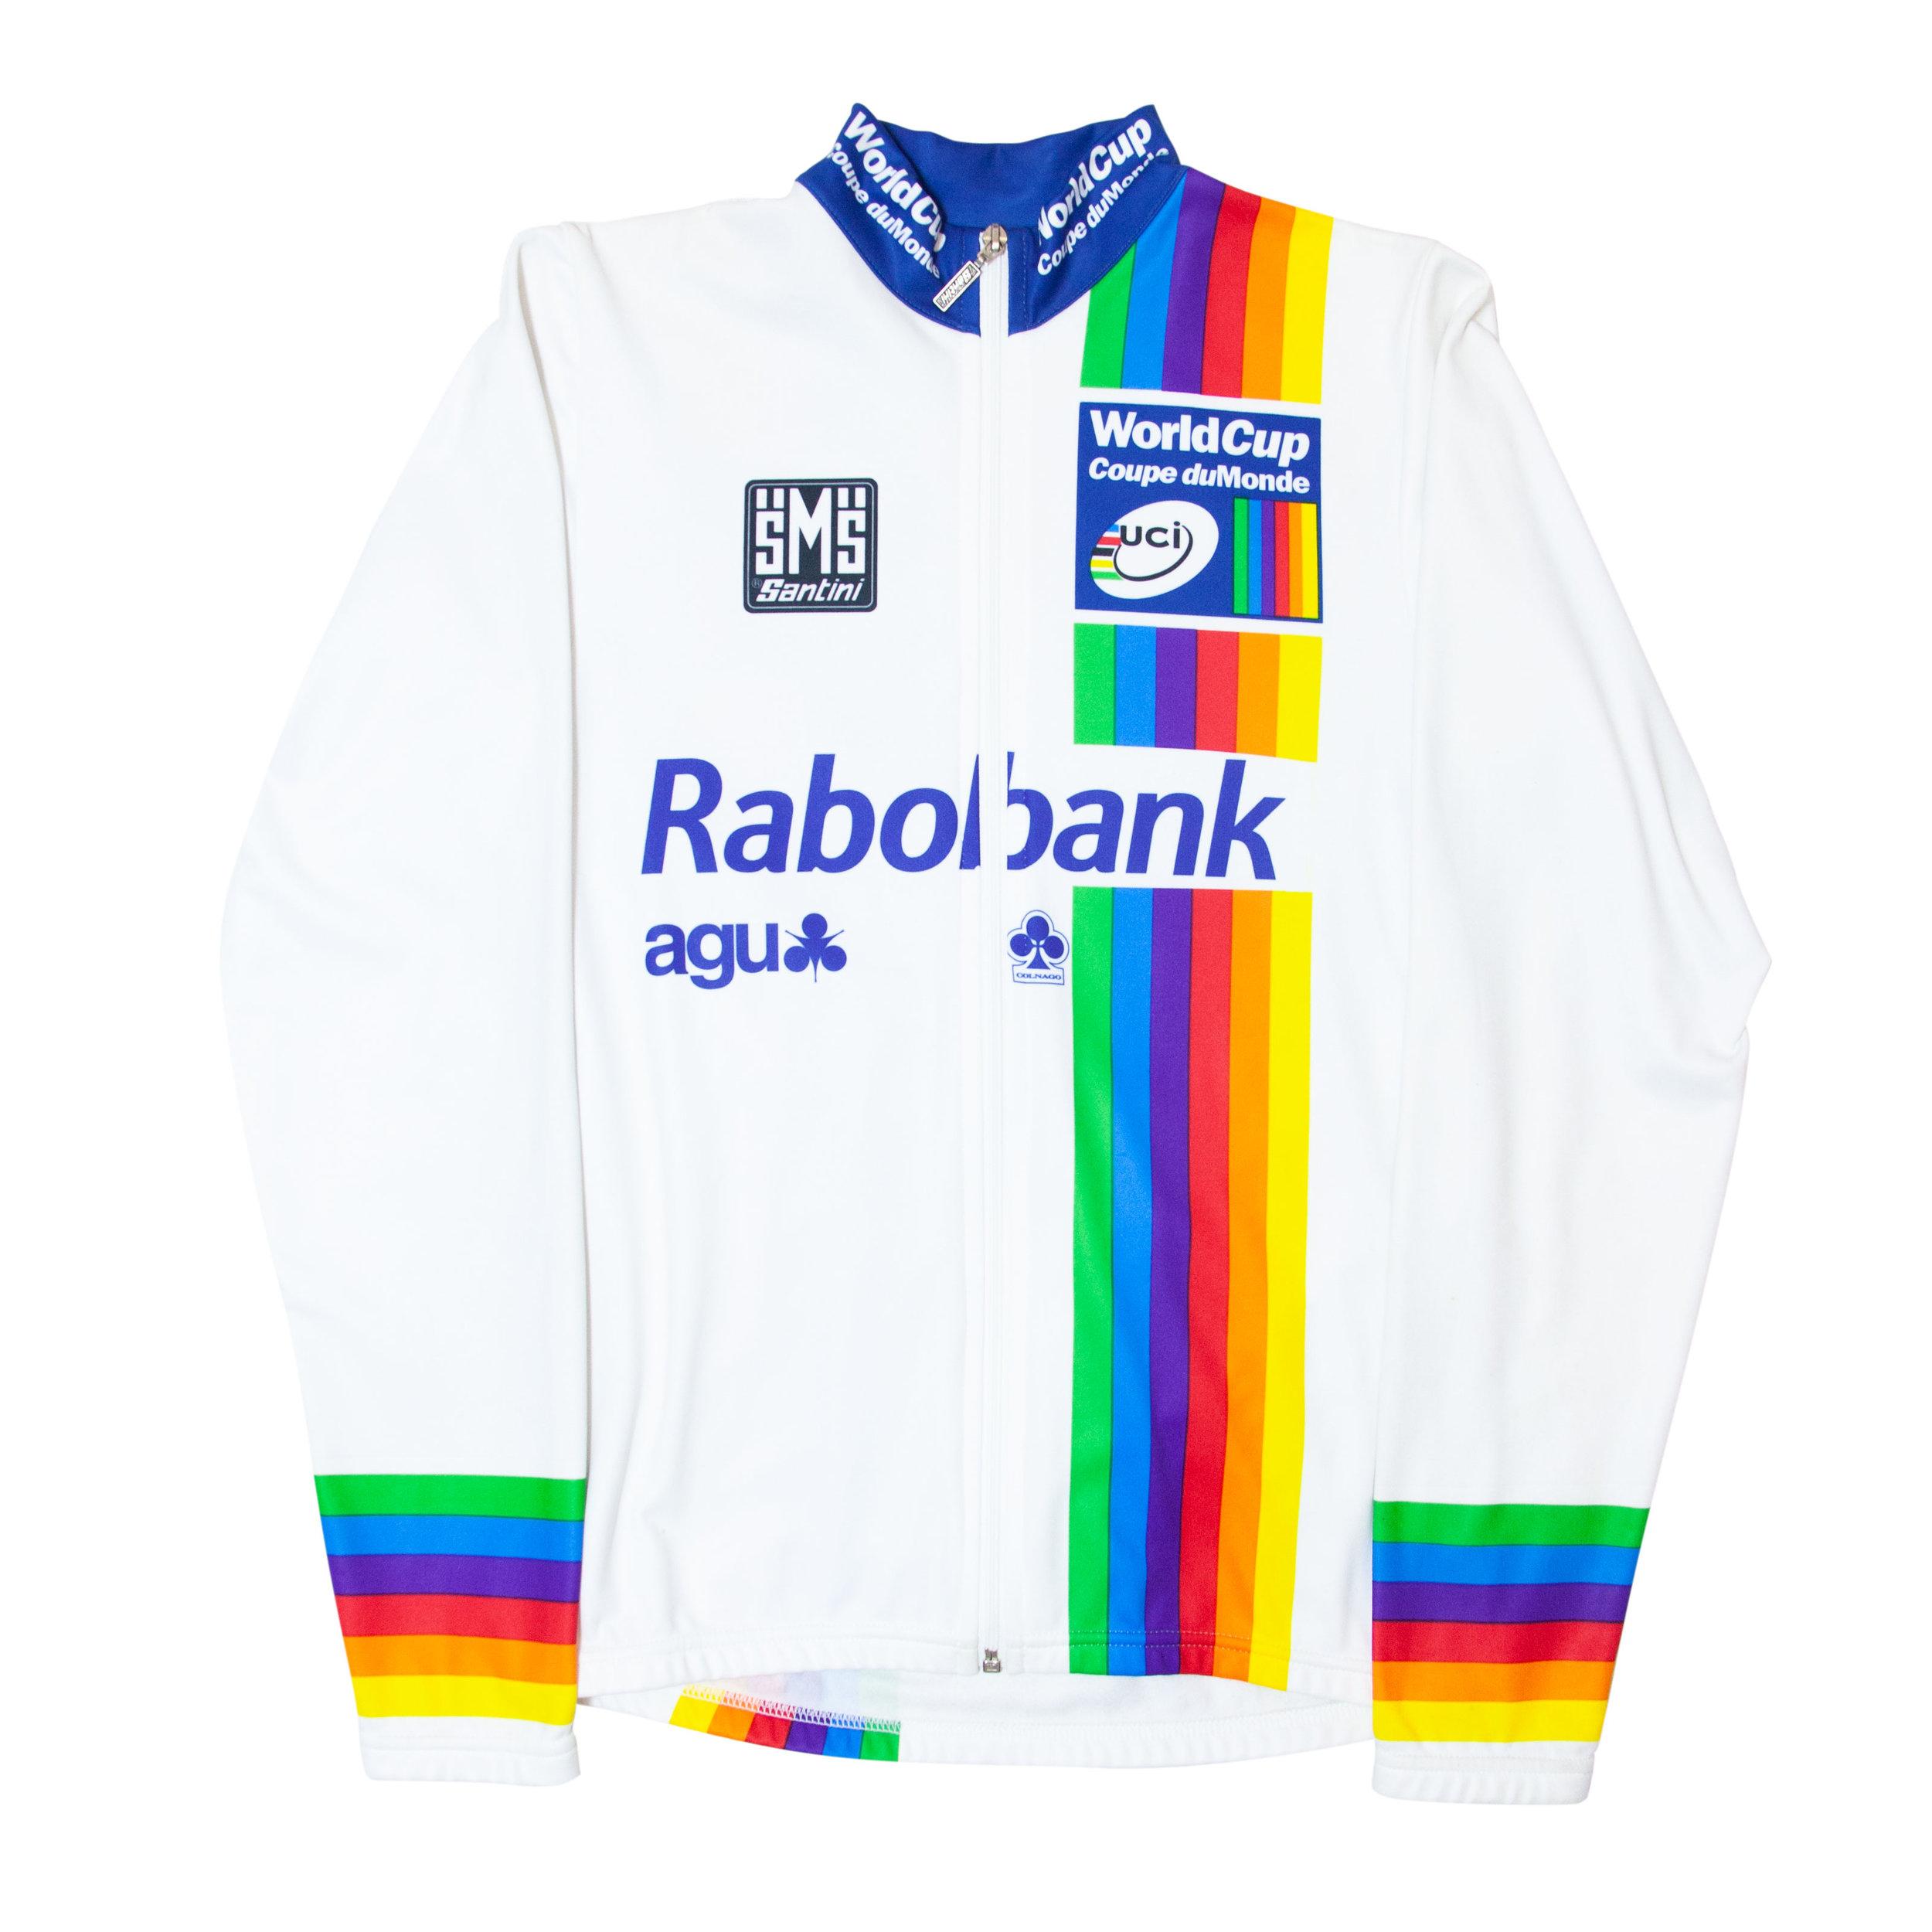 Erik-Dekker Rabobank-uci world cup.jpg